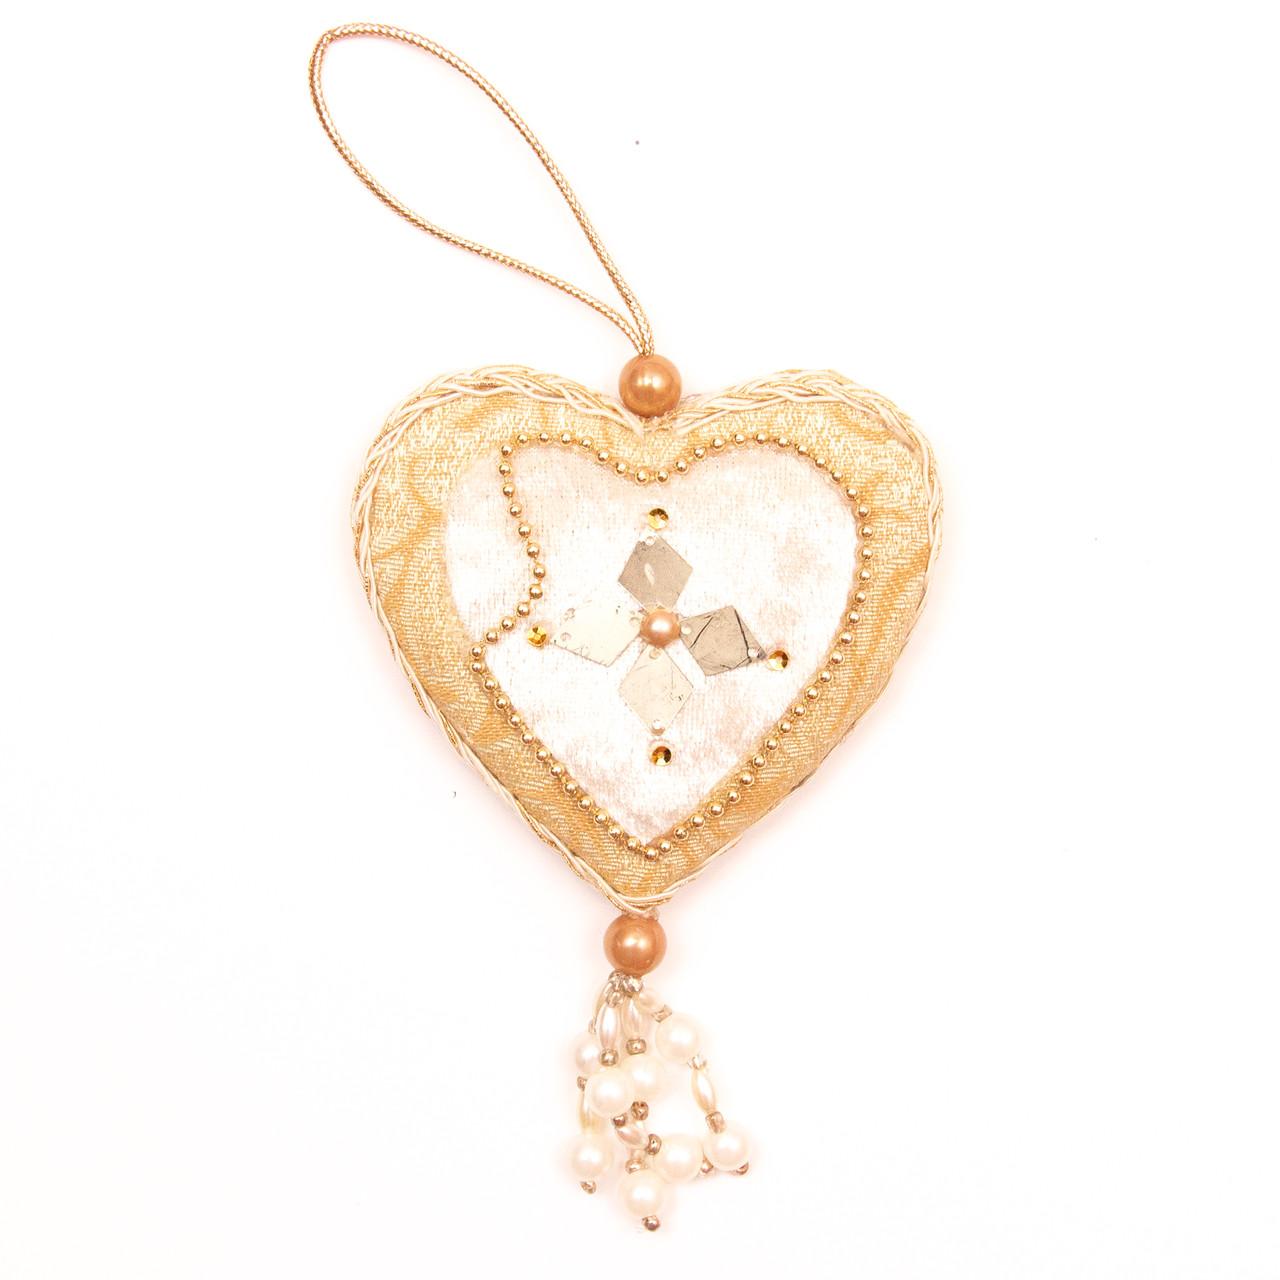 Елочная игрушка из ткани, 10 см, сердце (430130-4)